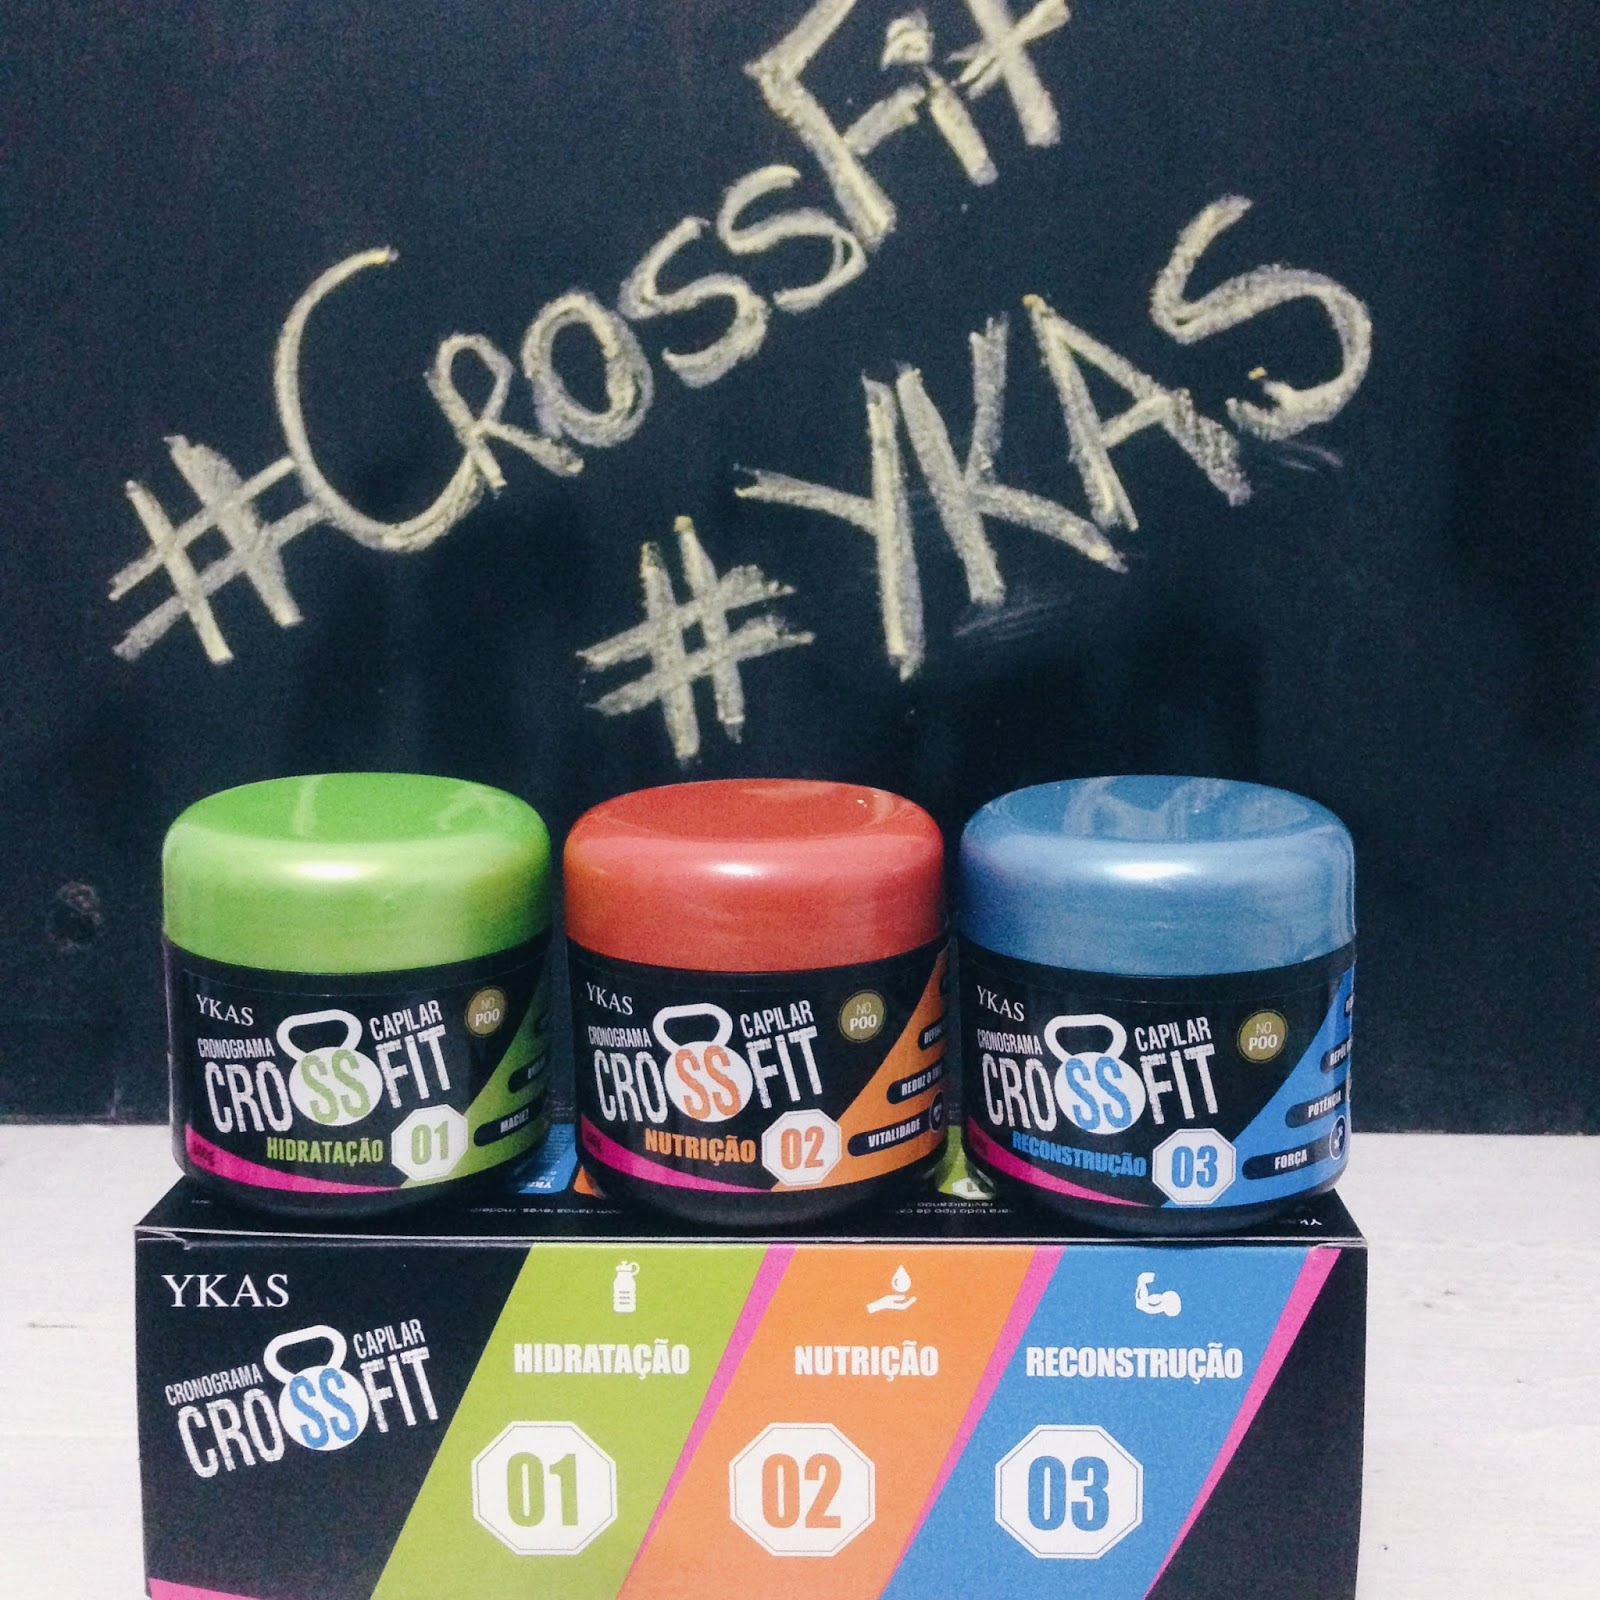 Ykas CrossFit Cronograma